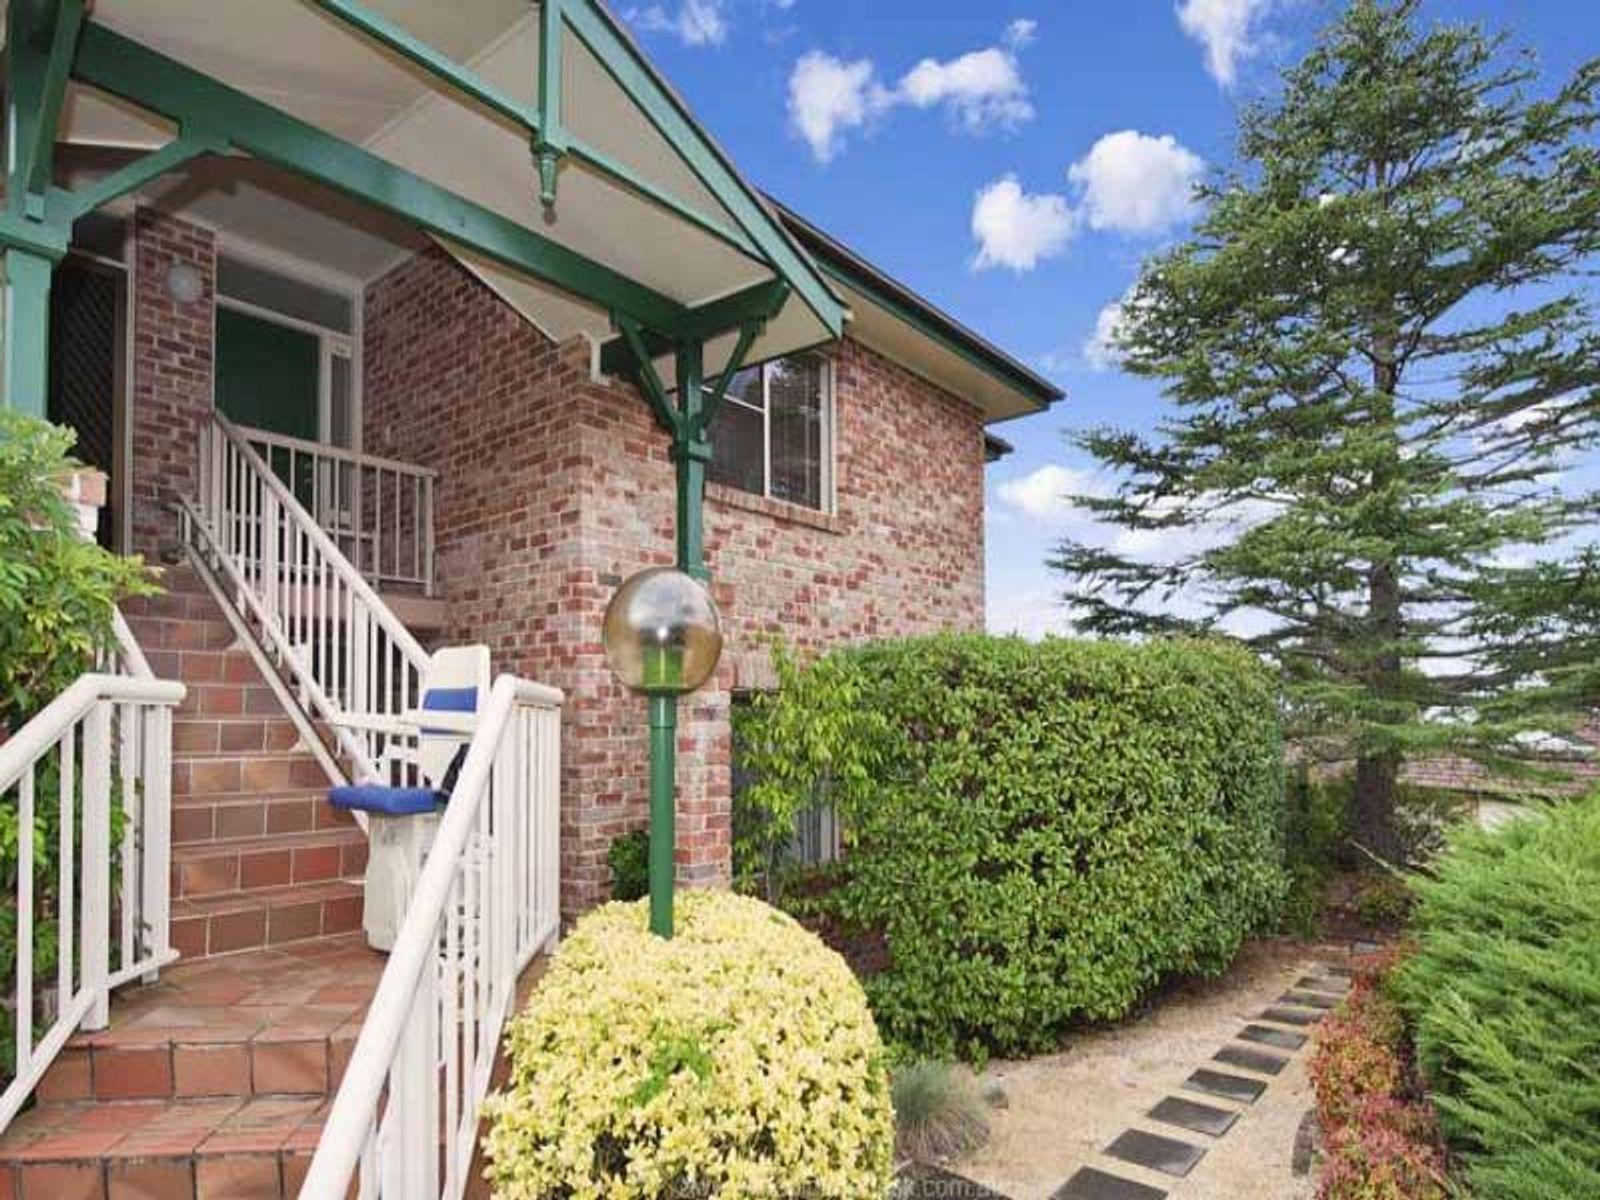 79/2-8 Kitchener Street, St Ives, NSW 2075